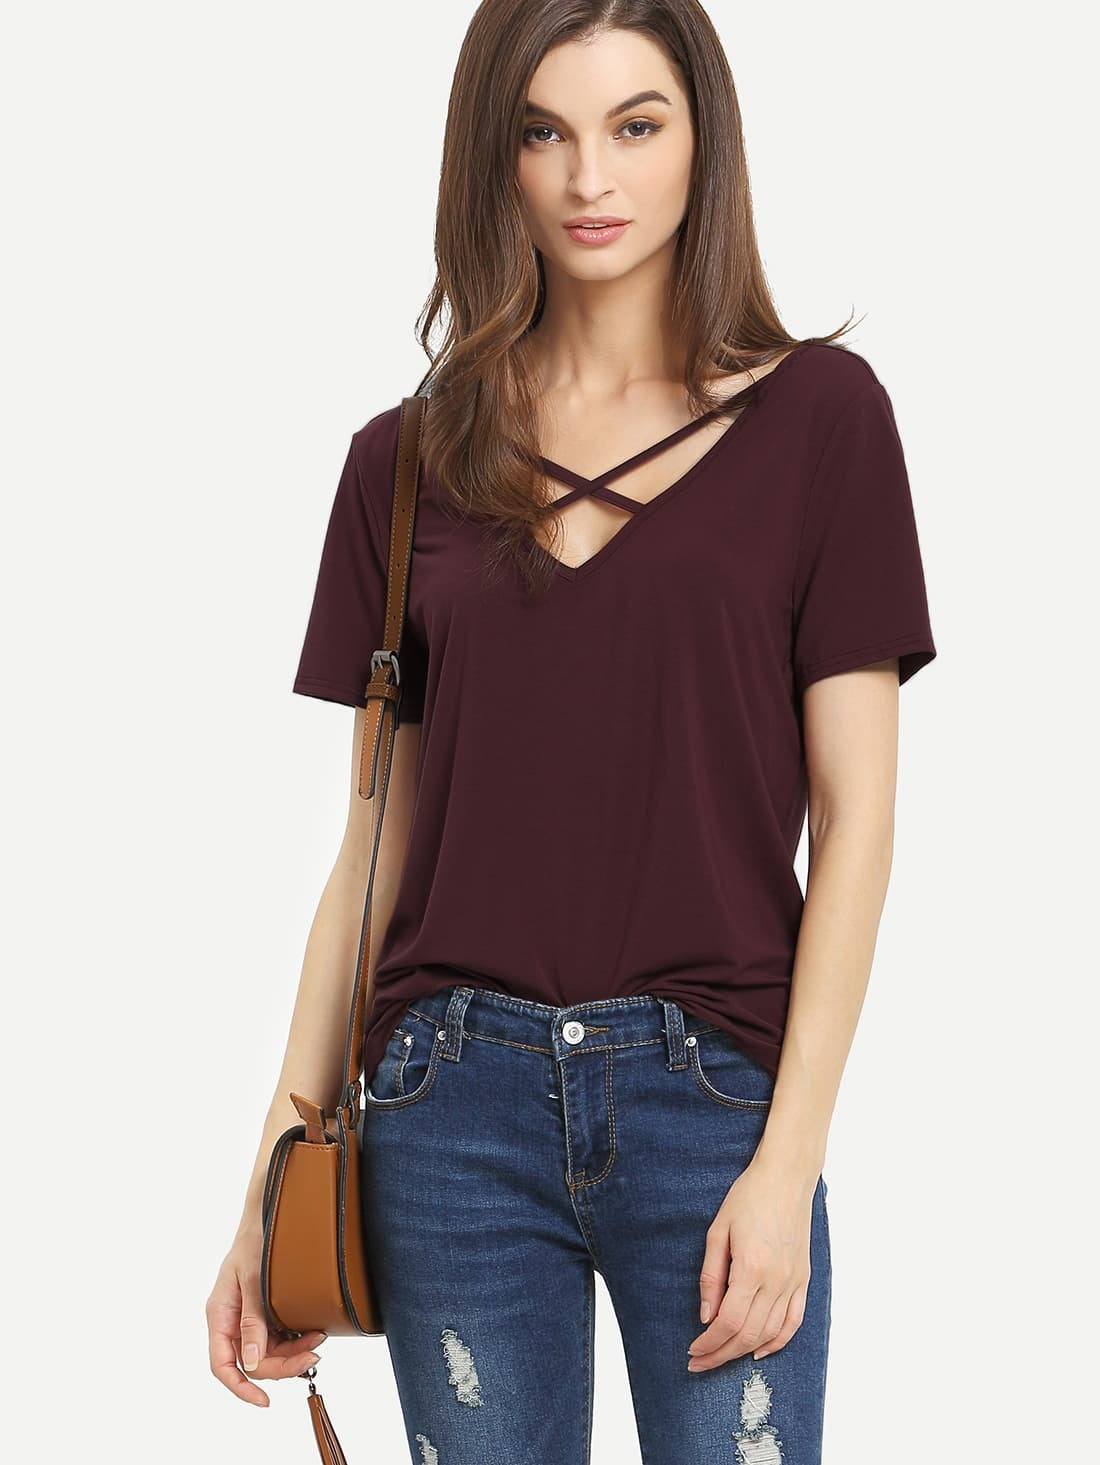 203e7556 Burgundy Criss Cross Front Casual T-shirt EmmaCloth-Women Fast ...